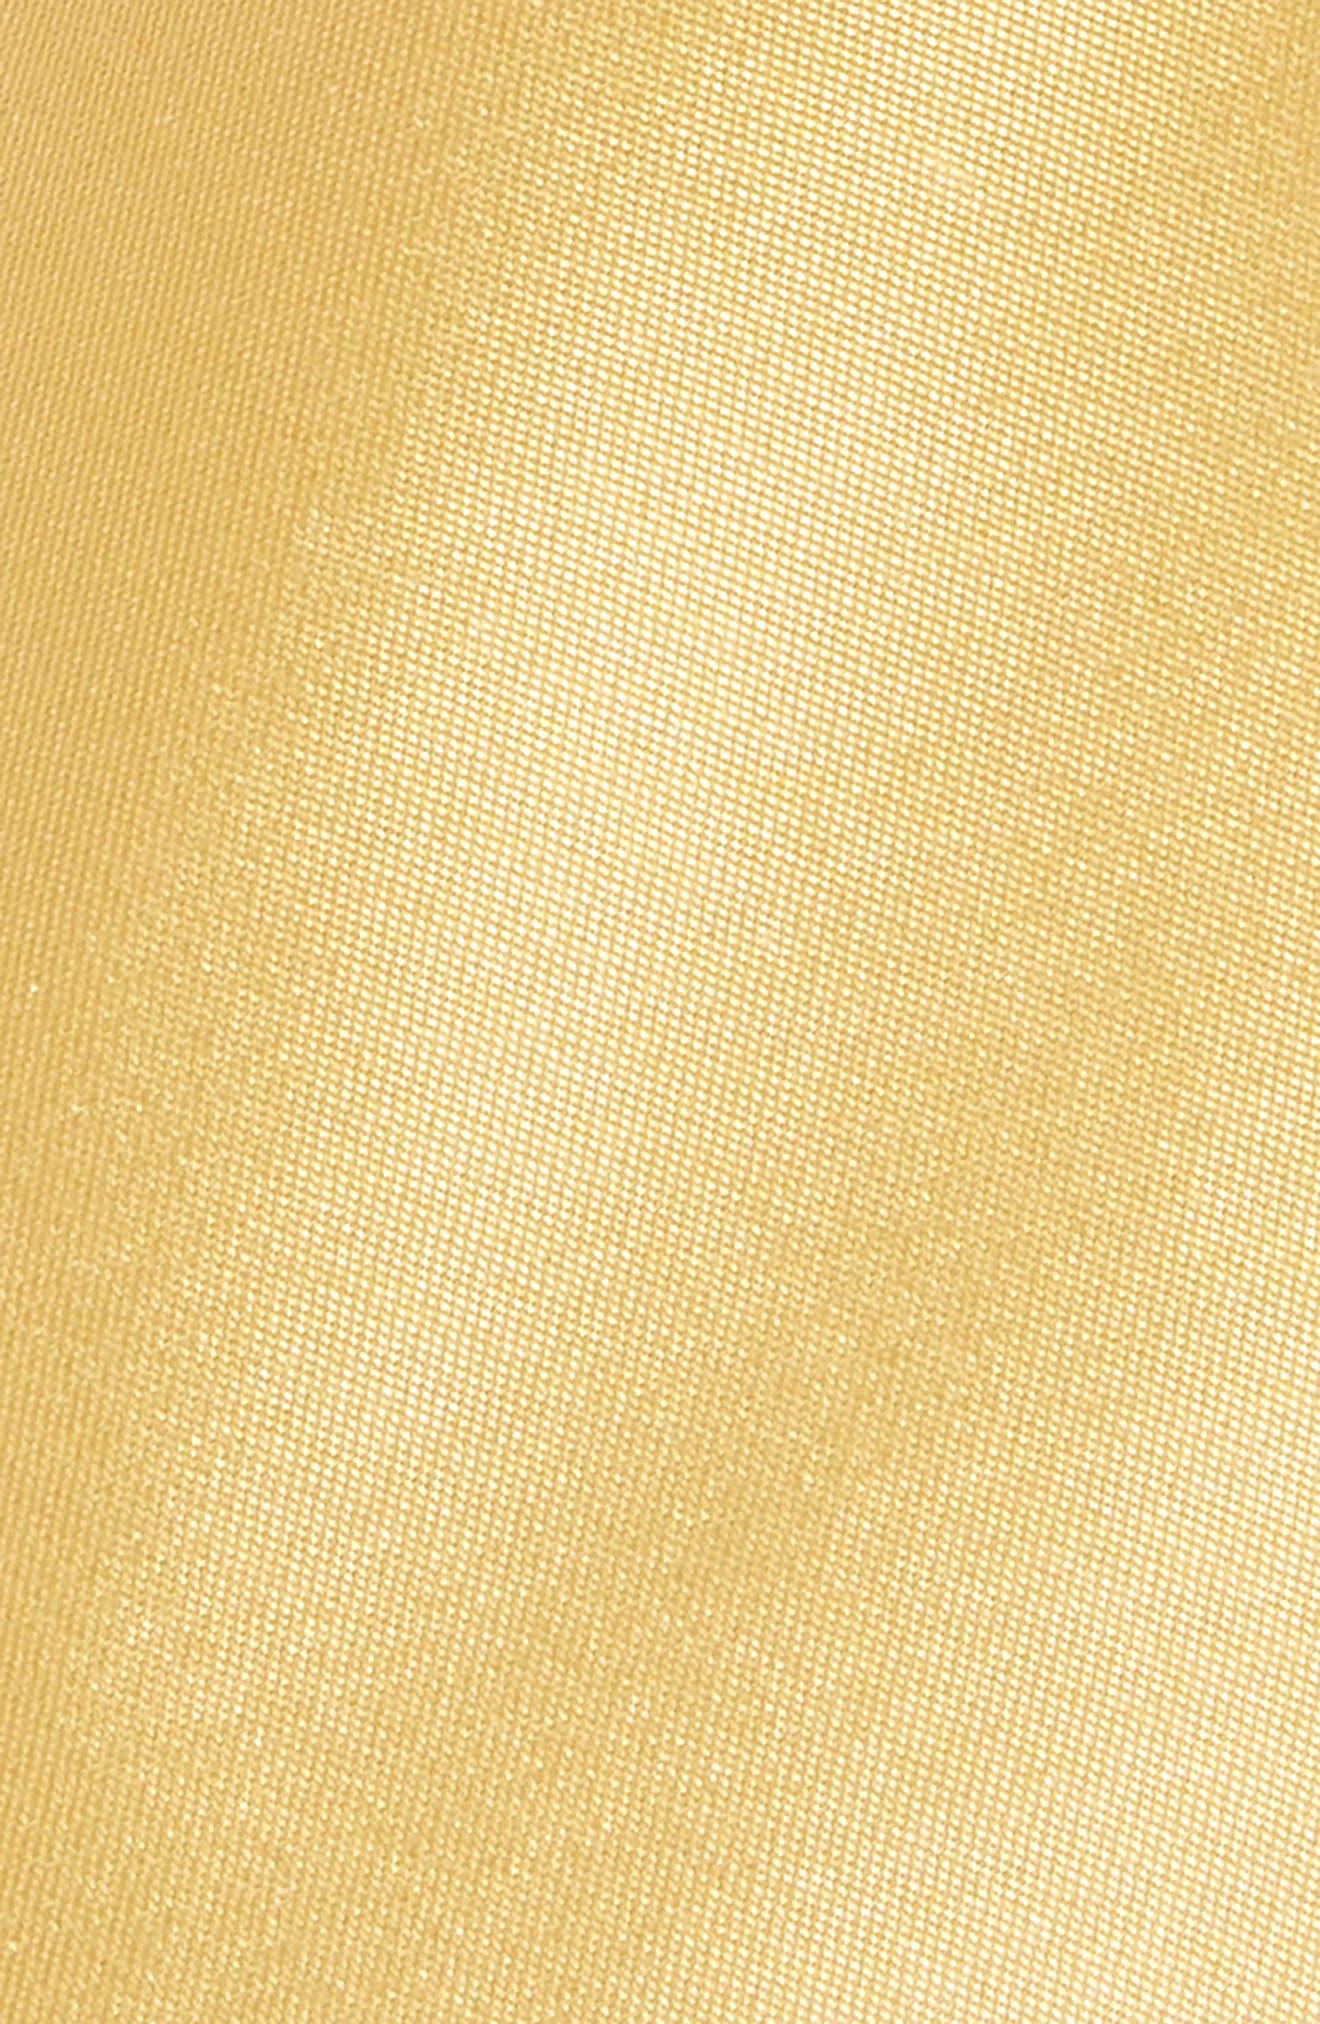 Solid Matte Satin Tie,                             Alternate thumbnail 2, color,